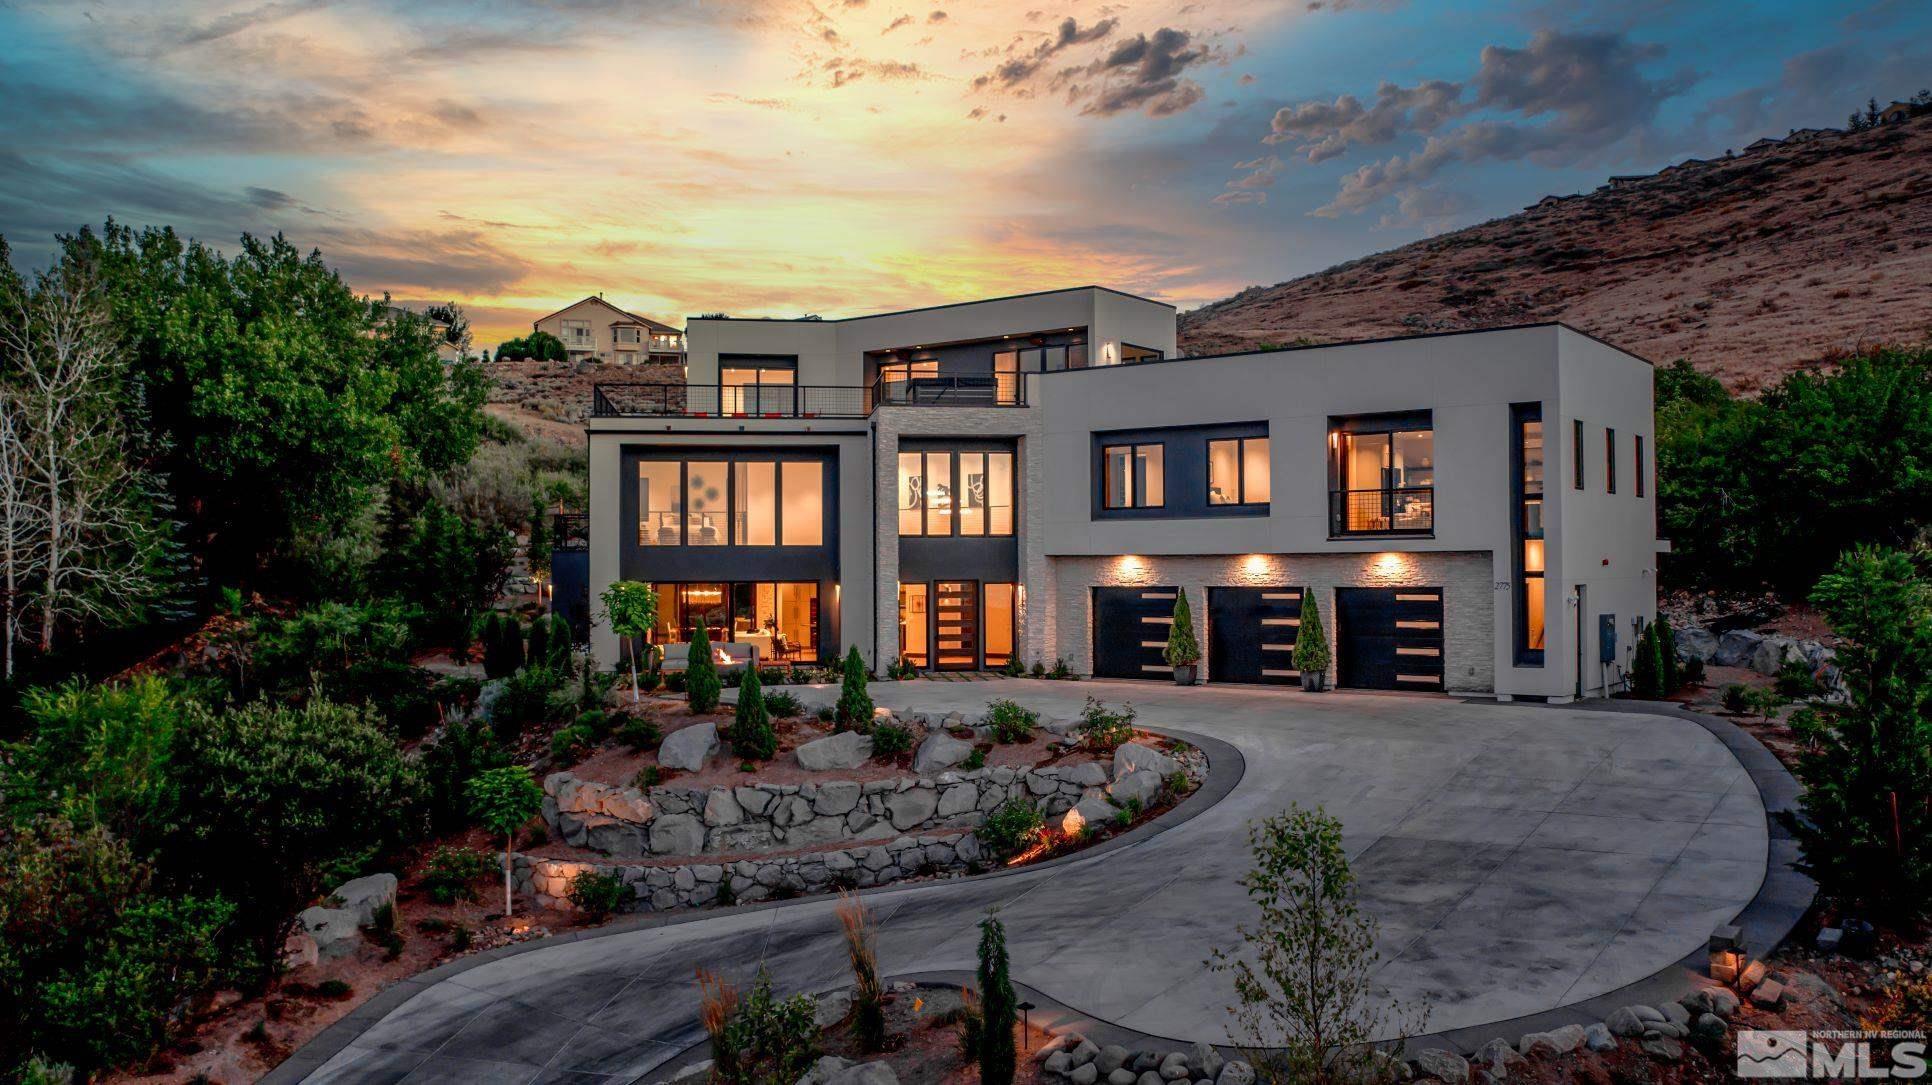 Image for 2775 W Lake Ridge Shores, Reno, NV 89519-5737